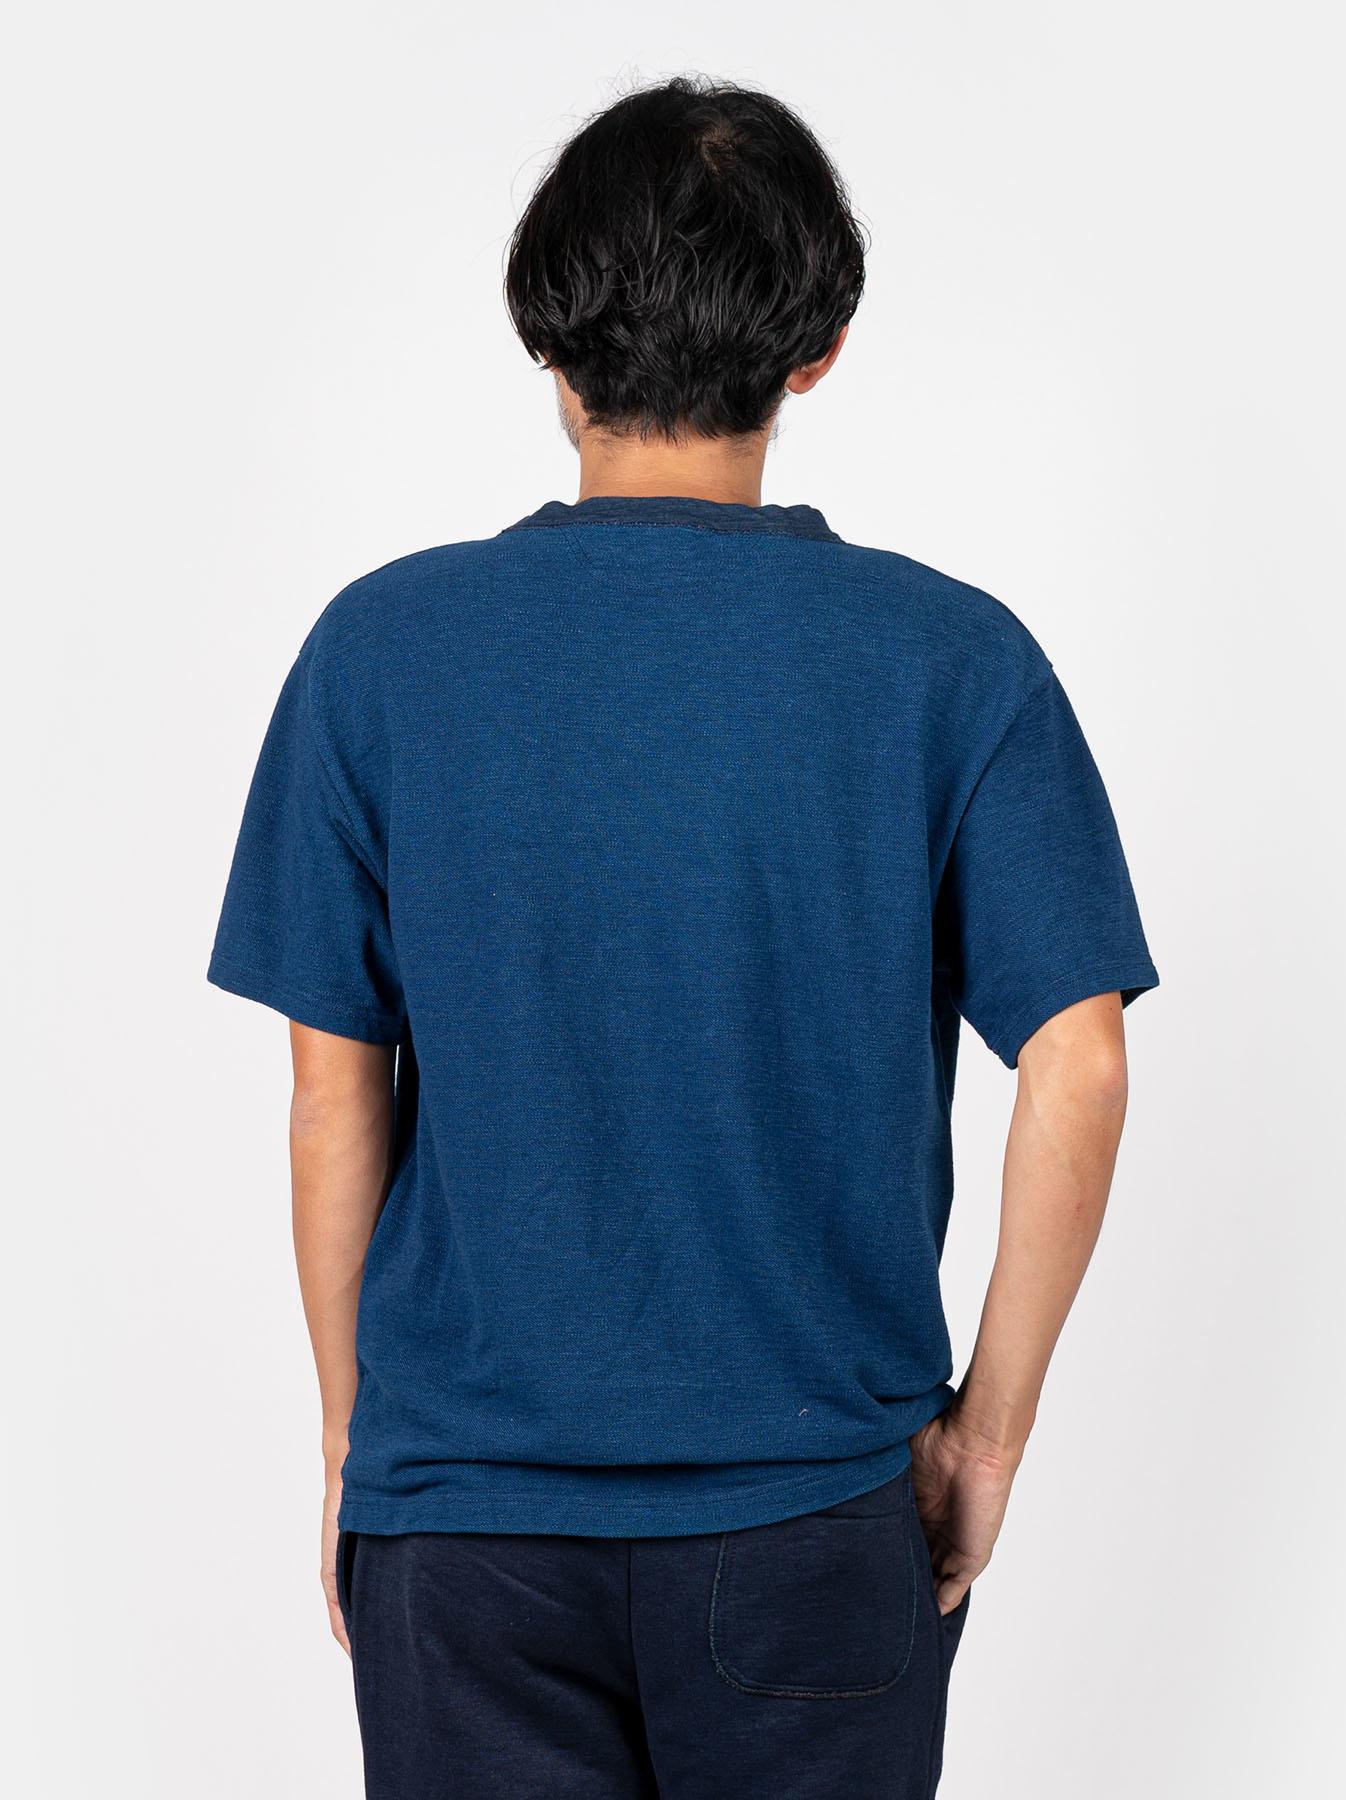 WH Indigo Ultimate Pique T-shirt Distressed-5